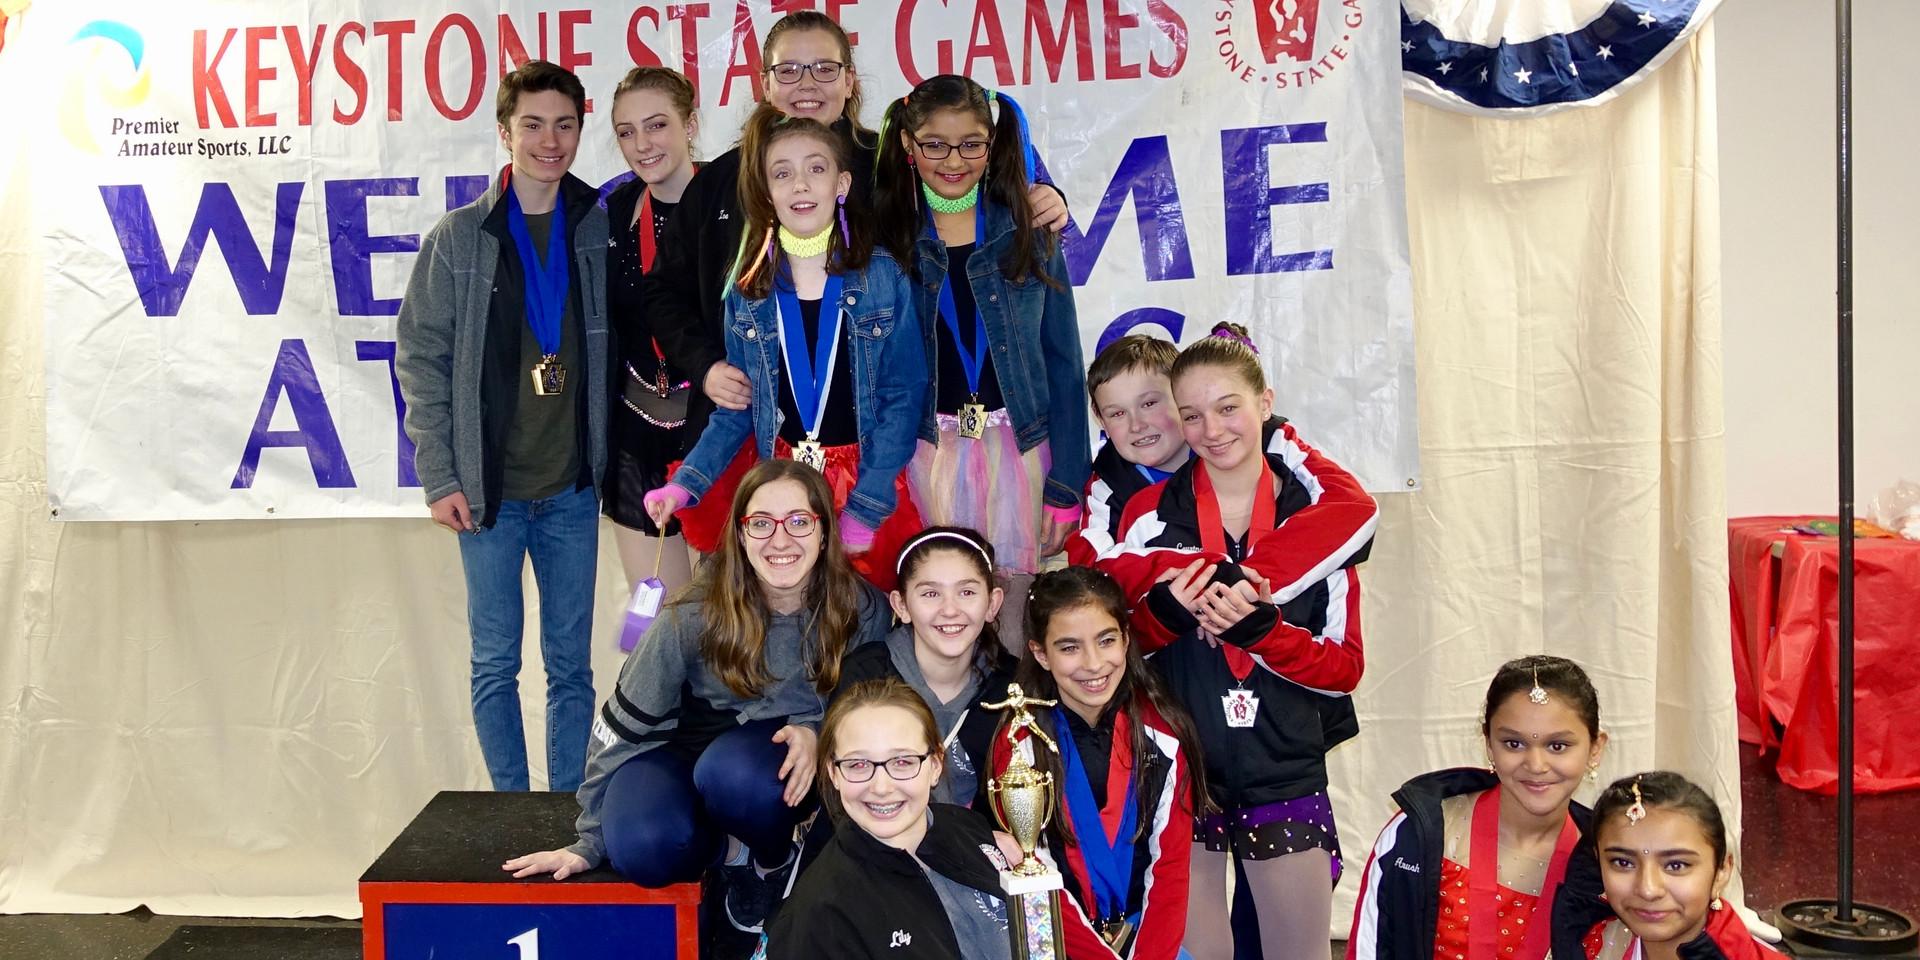 Keystone State Games - 2018